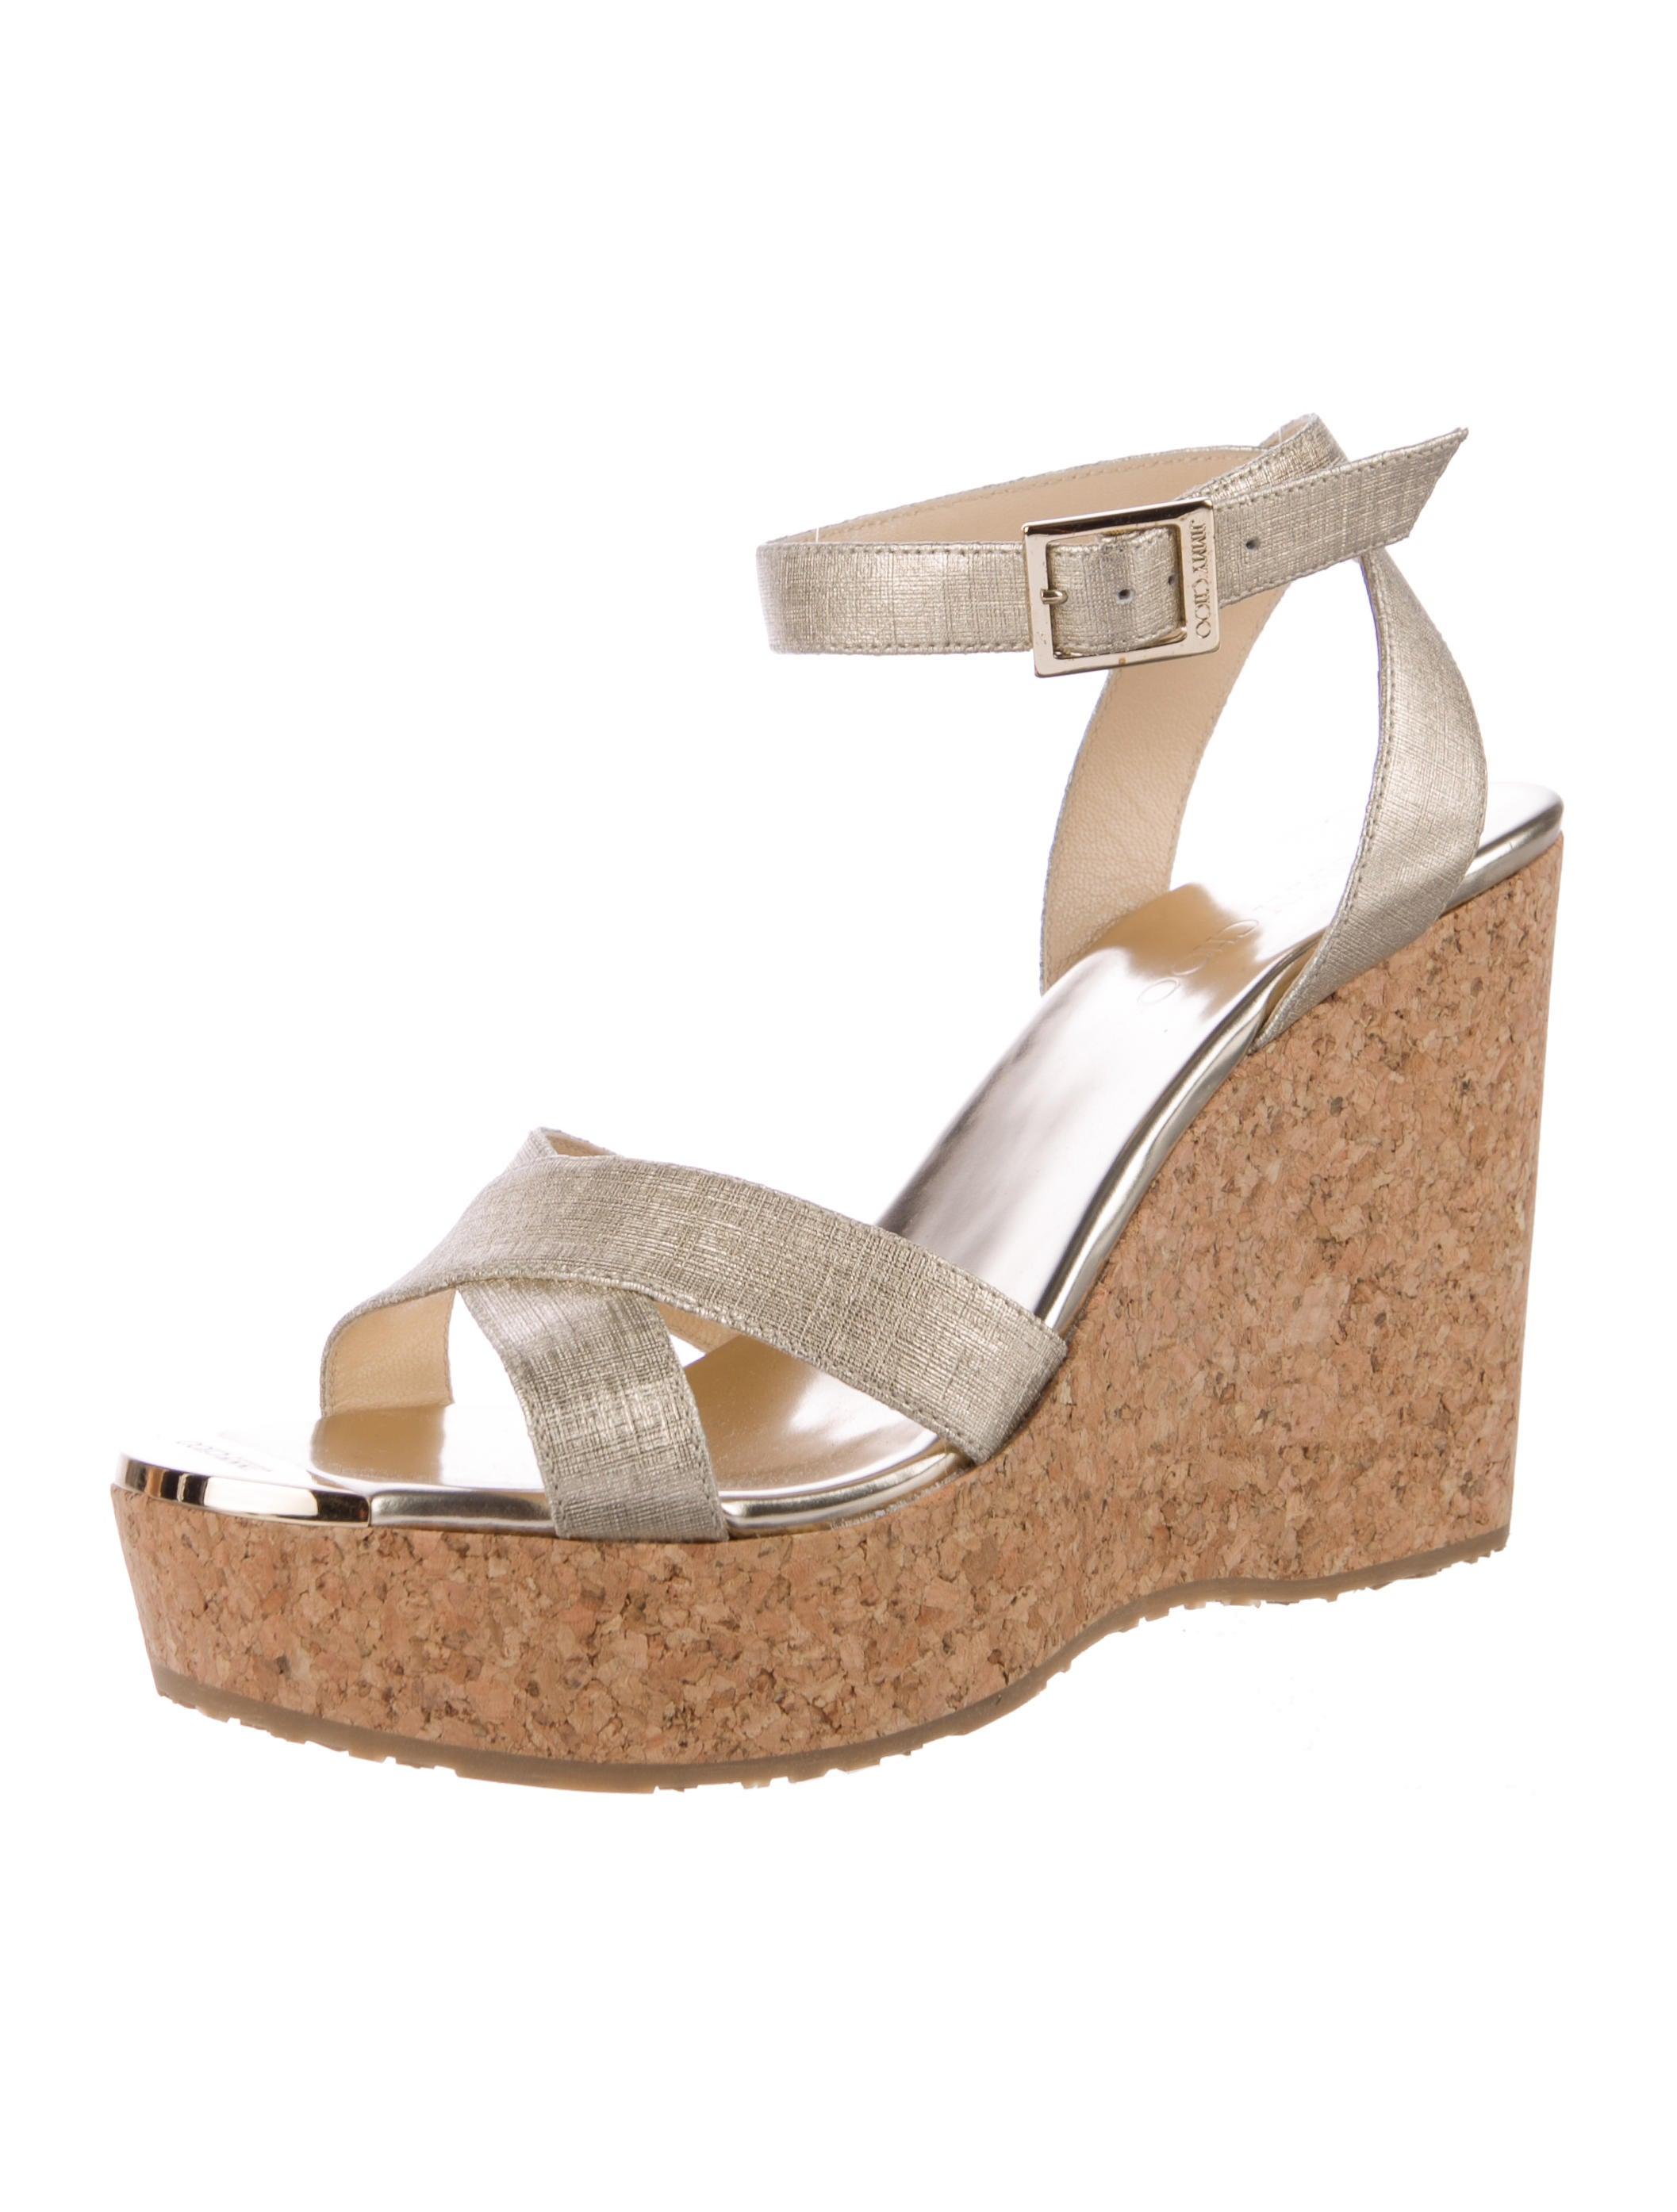 jimmy choo metallic platform wedges shoes jim71210